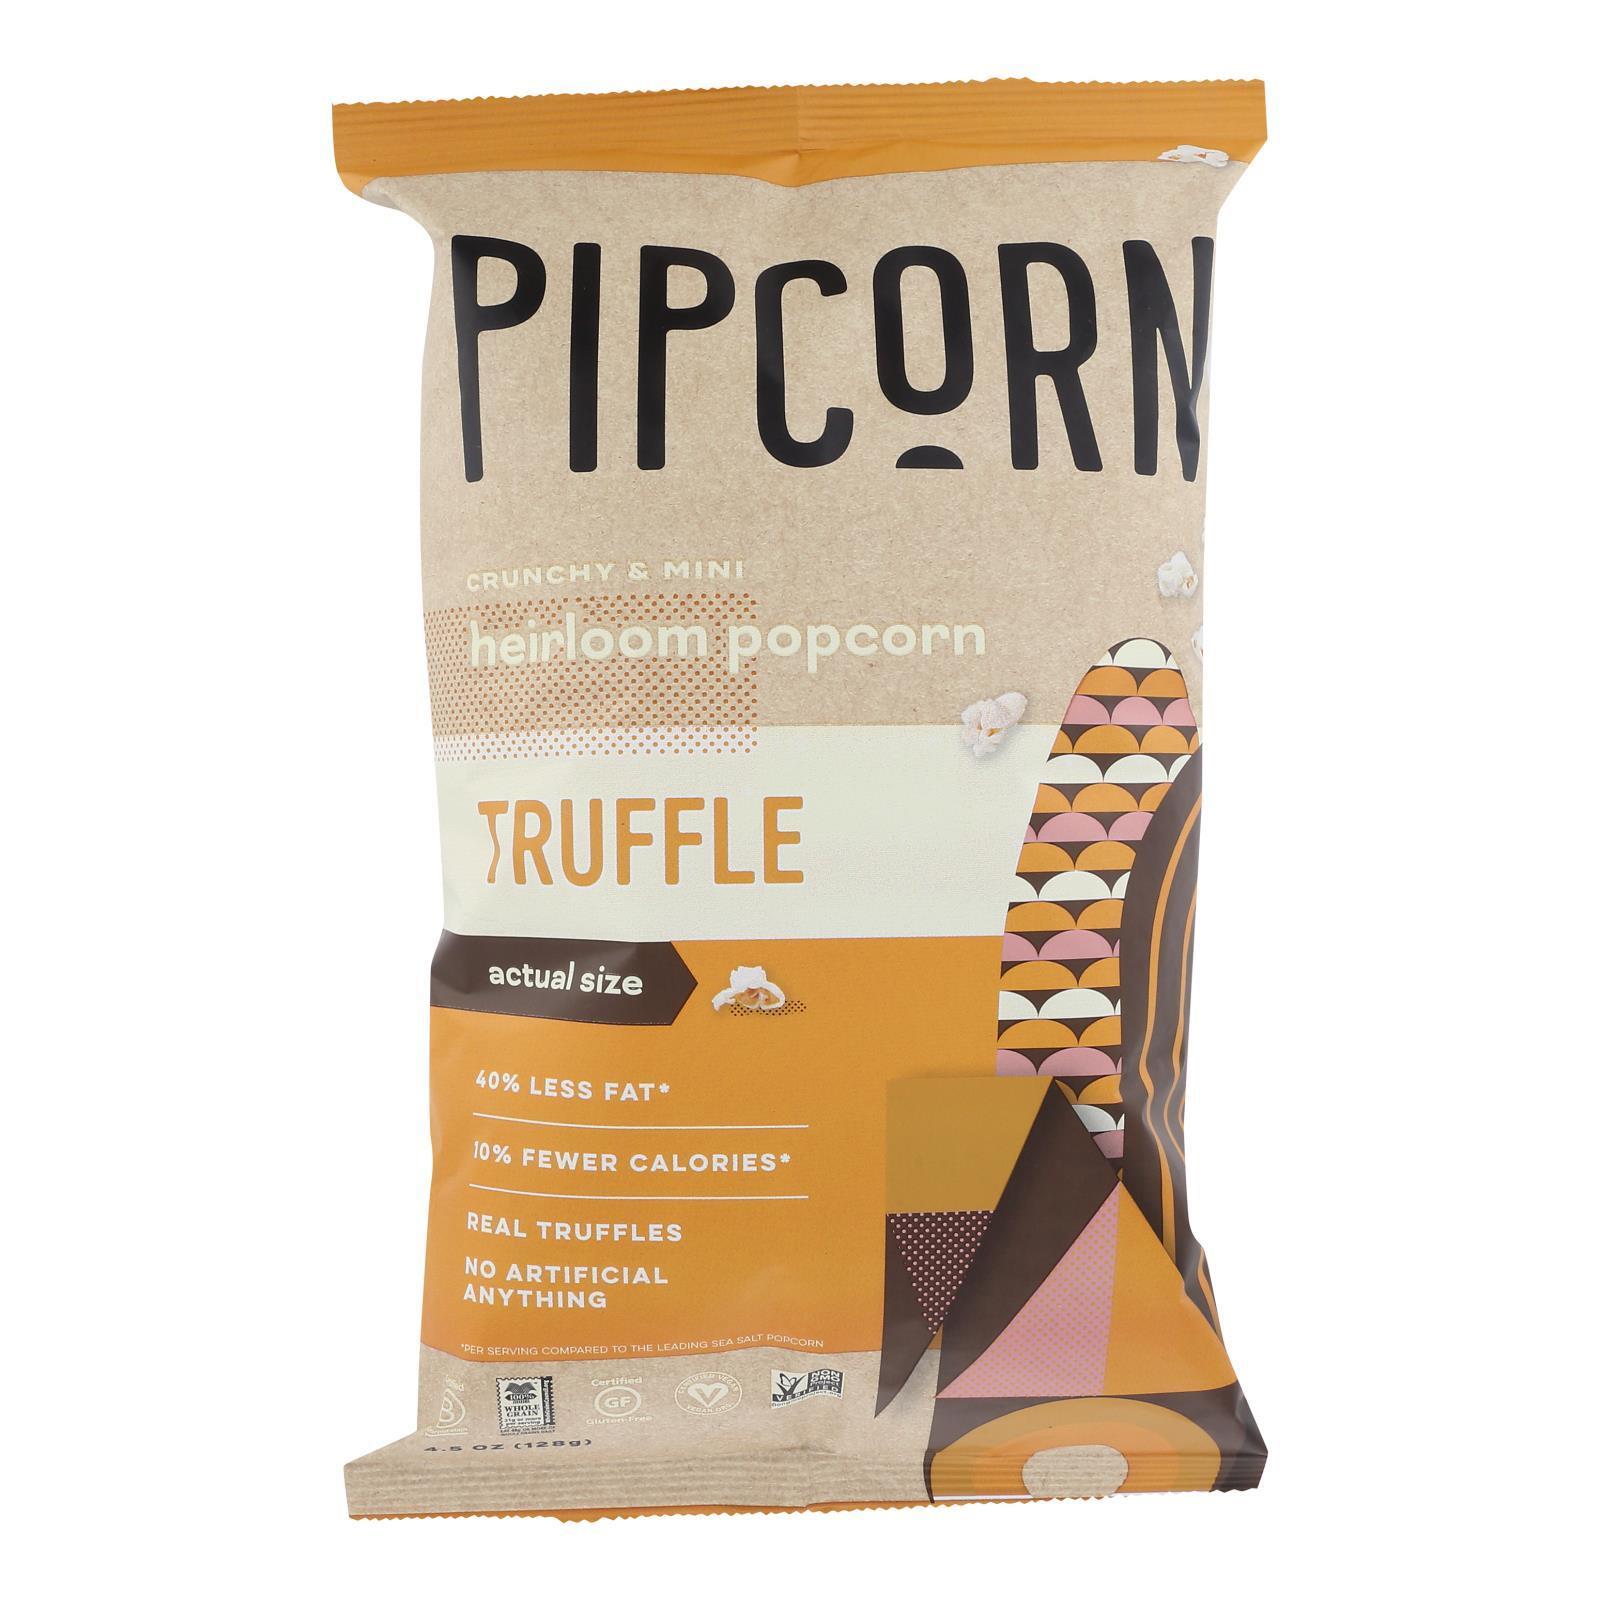 Pipcorn Mini Popcorn - Truffle - Case of 12 - 4 oz.